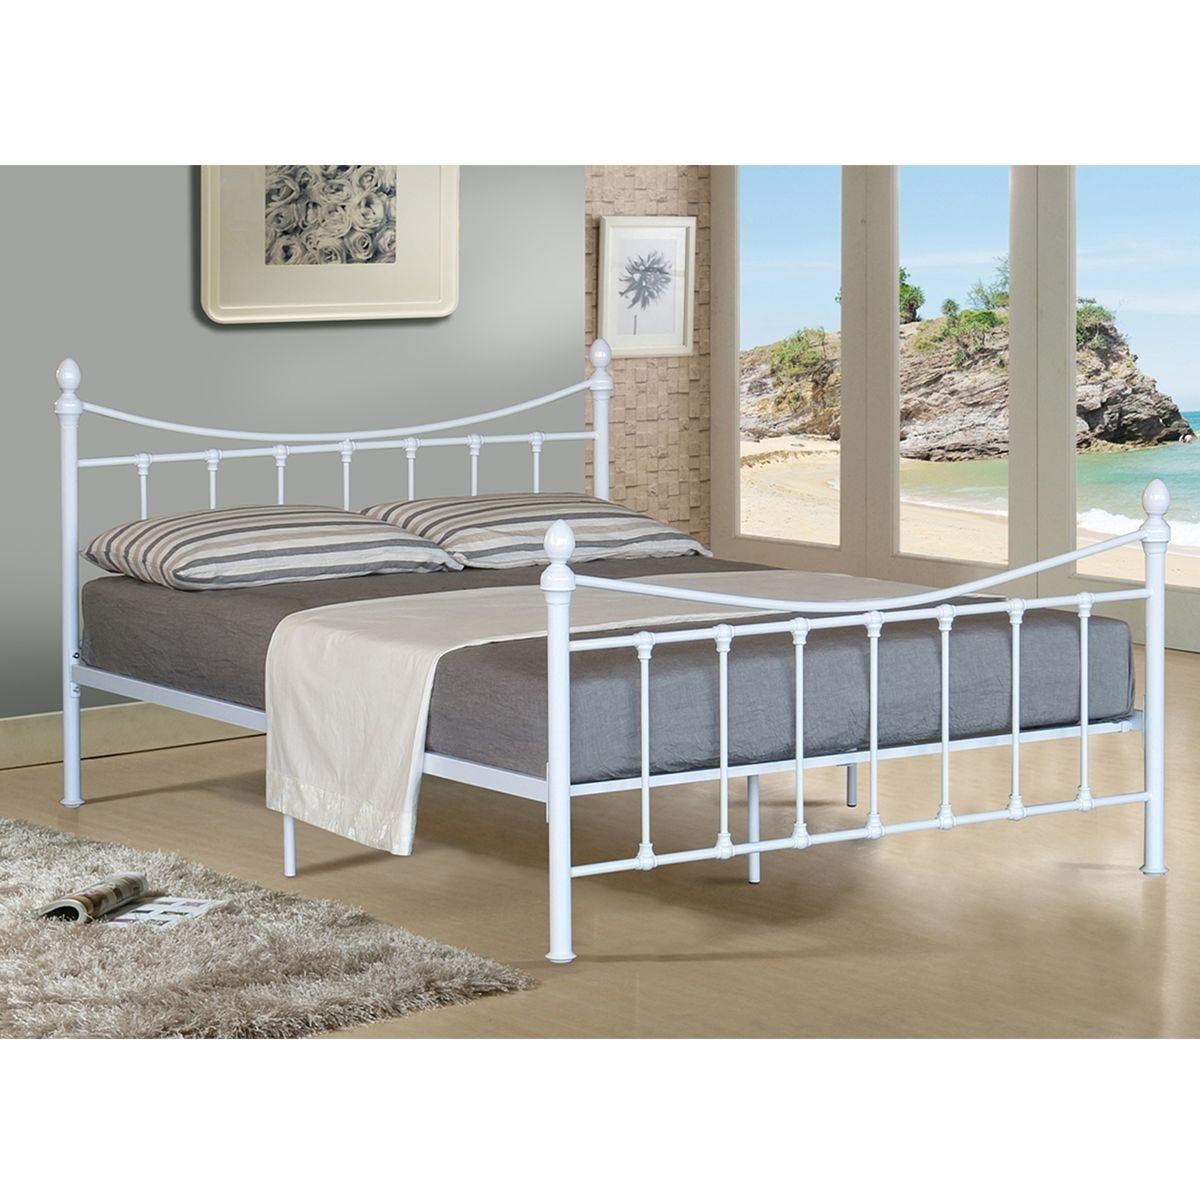 Olivia Metal Bed Frame - White